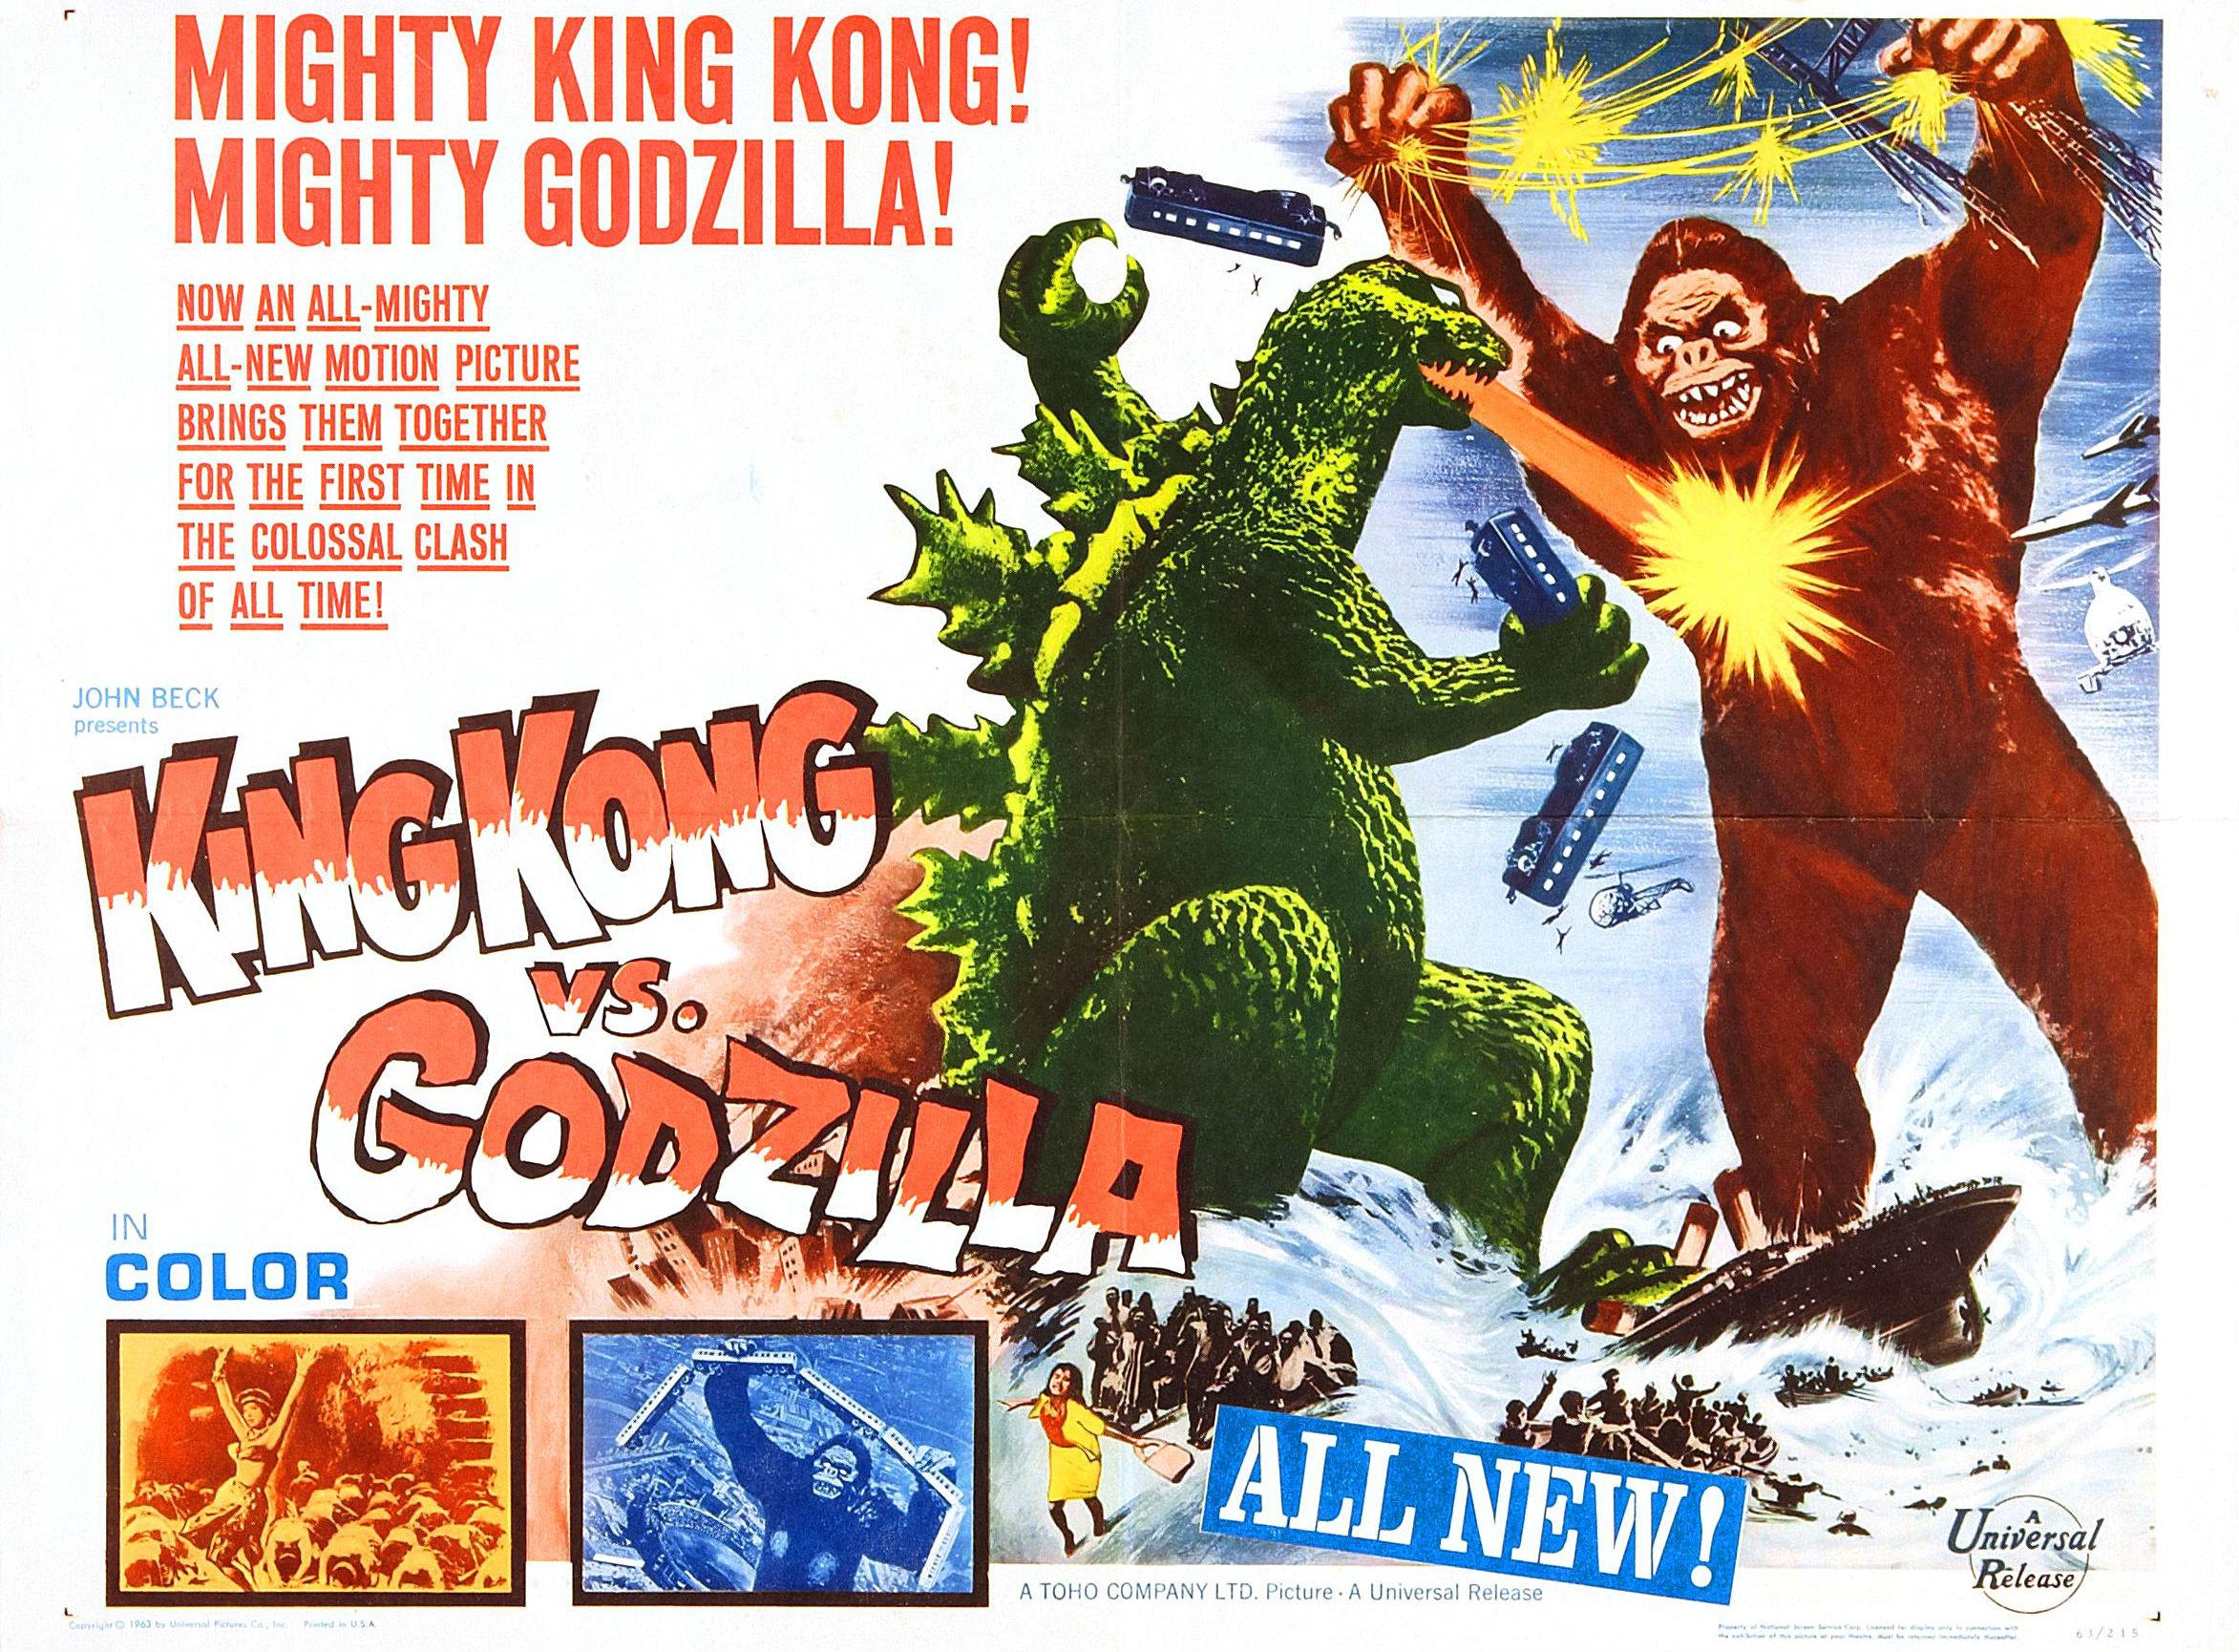 2 King Kong Vs Godzilla Hd Wallpapers  Backgrounds - Wallpaper Abyss-8985